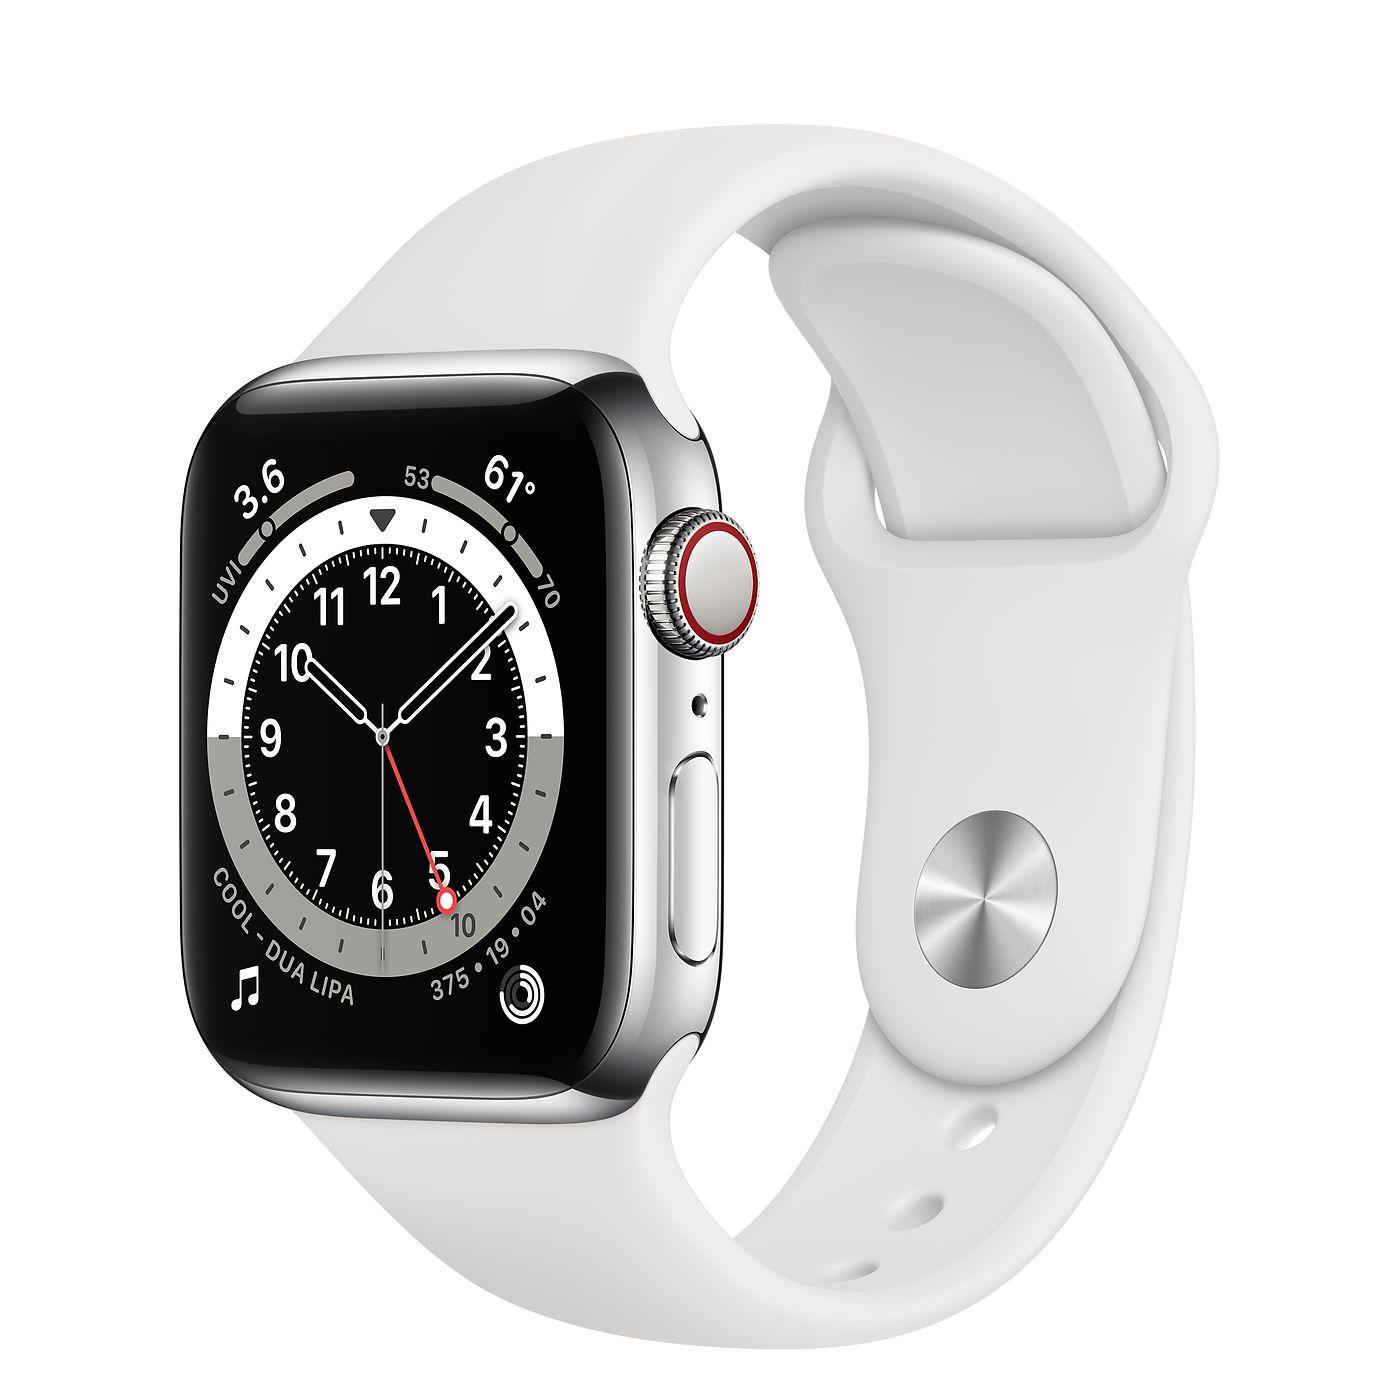 Apple 애플워치 6, GPS+Cellular, 실버 스테인리스 스틸 케이스, 화이트 스포츠 밴드